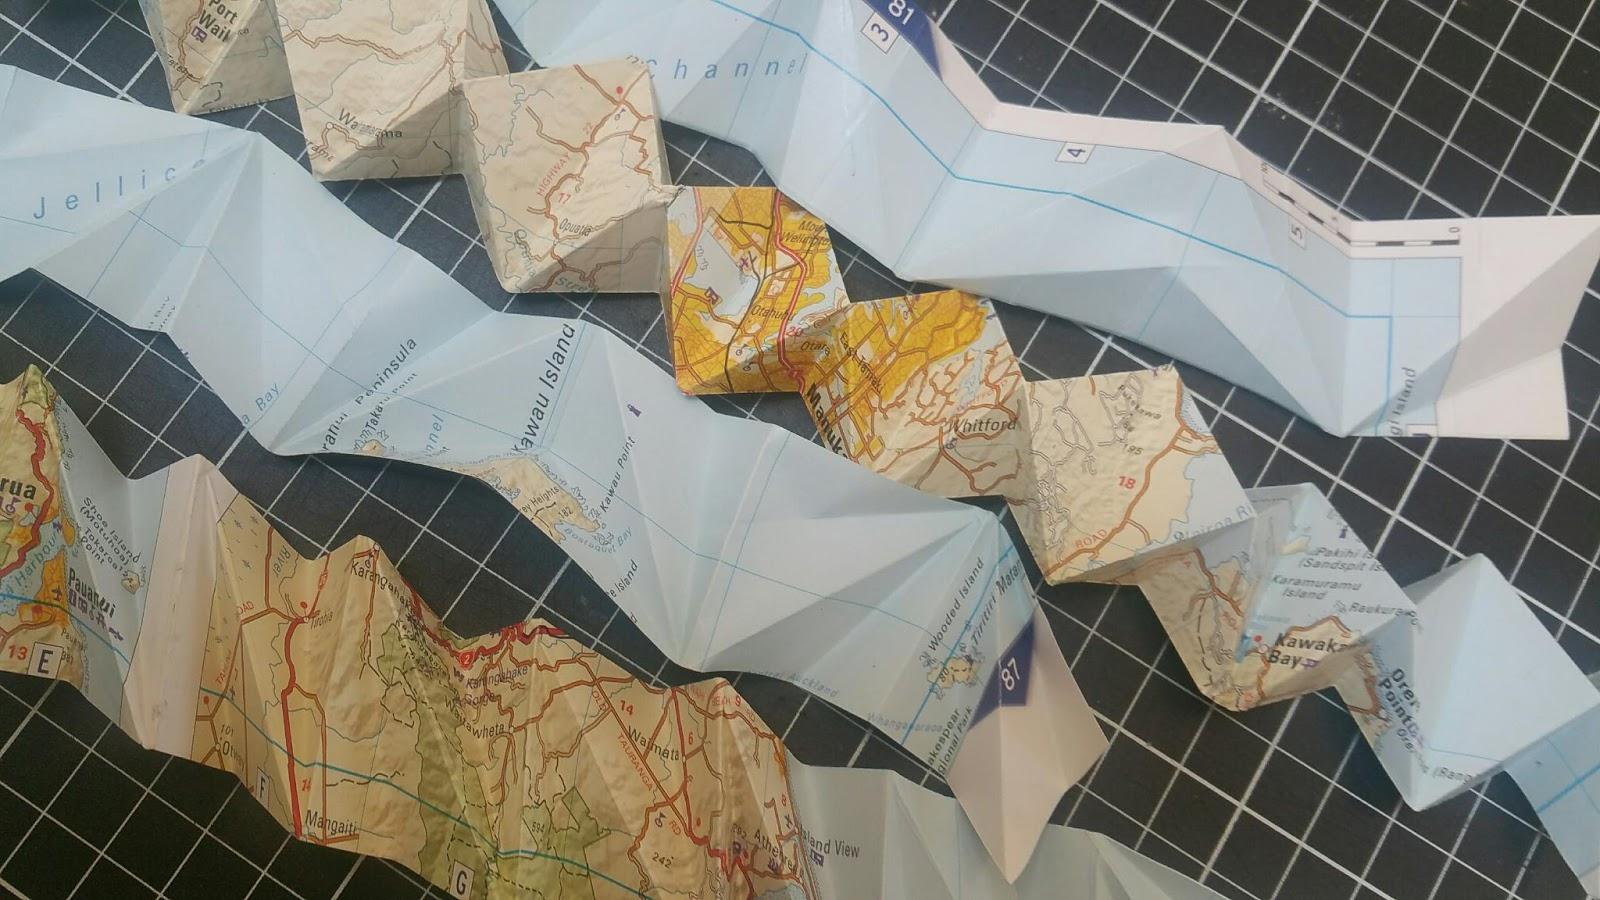 Folding 2